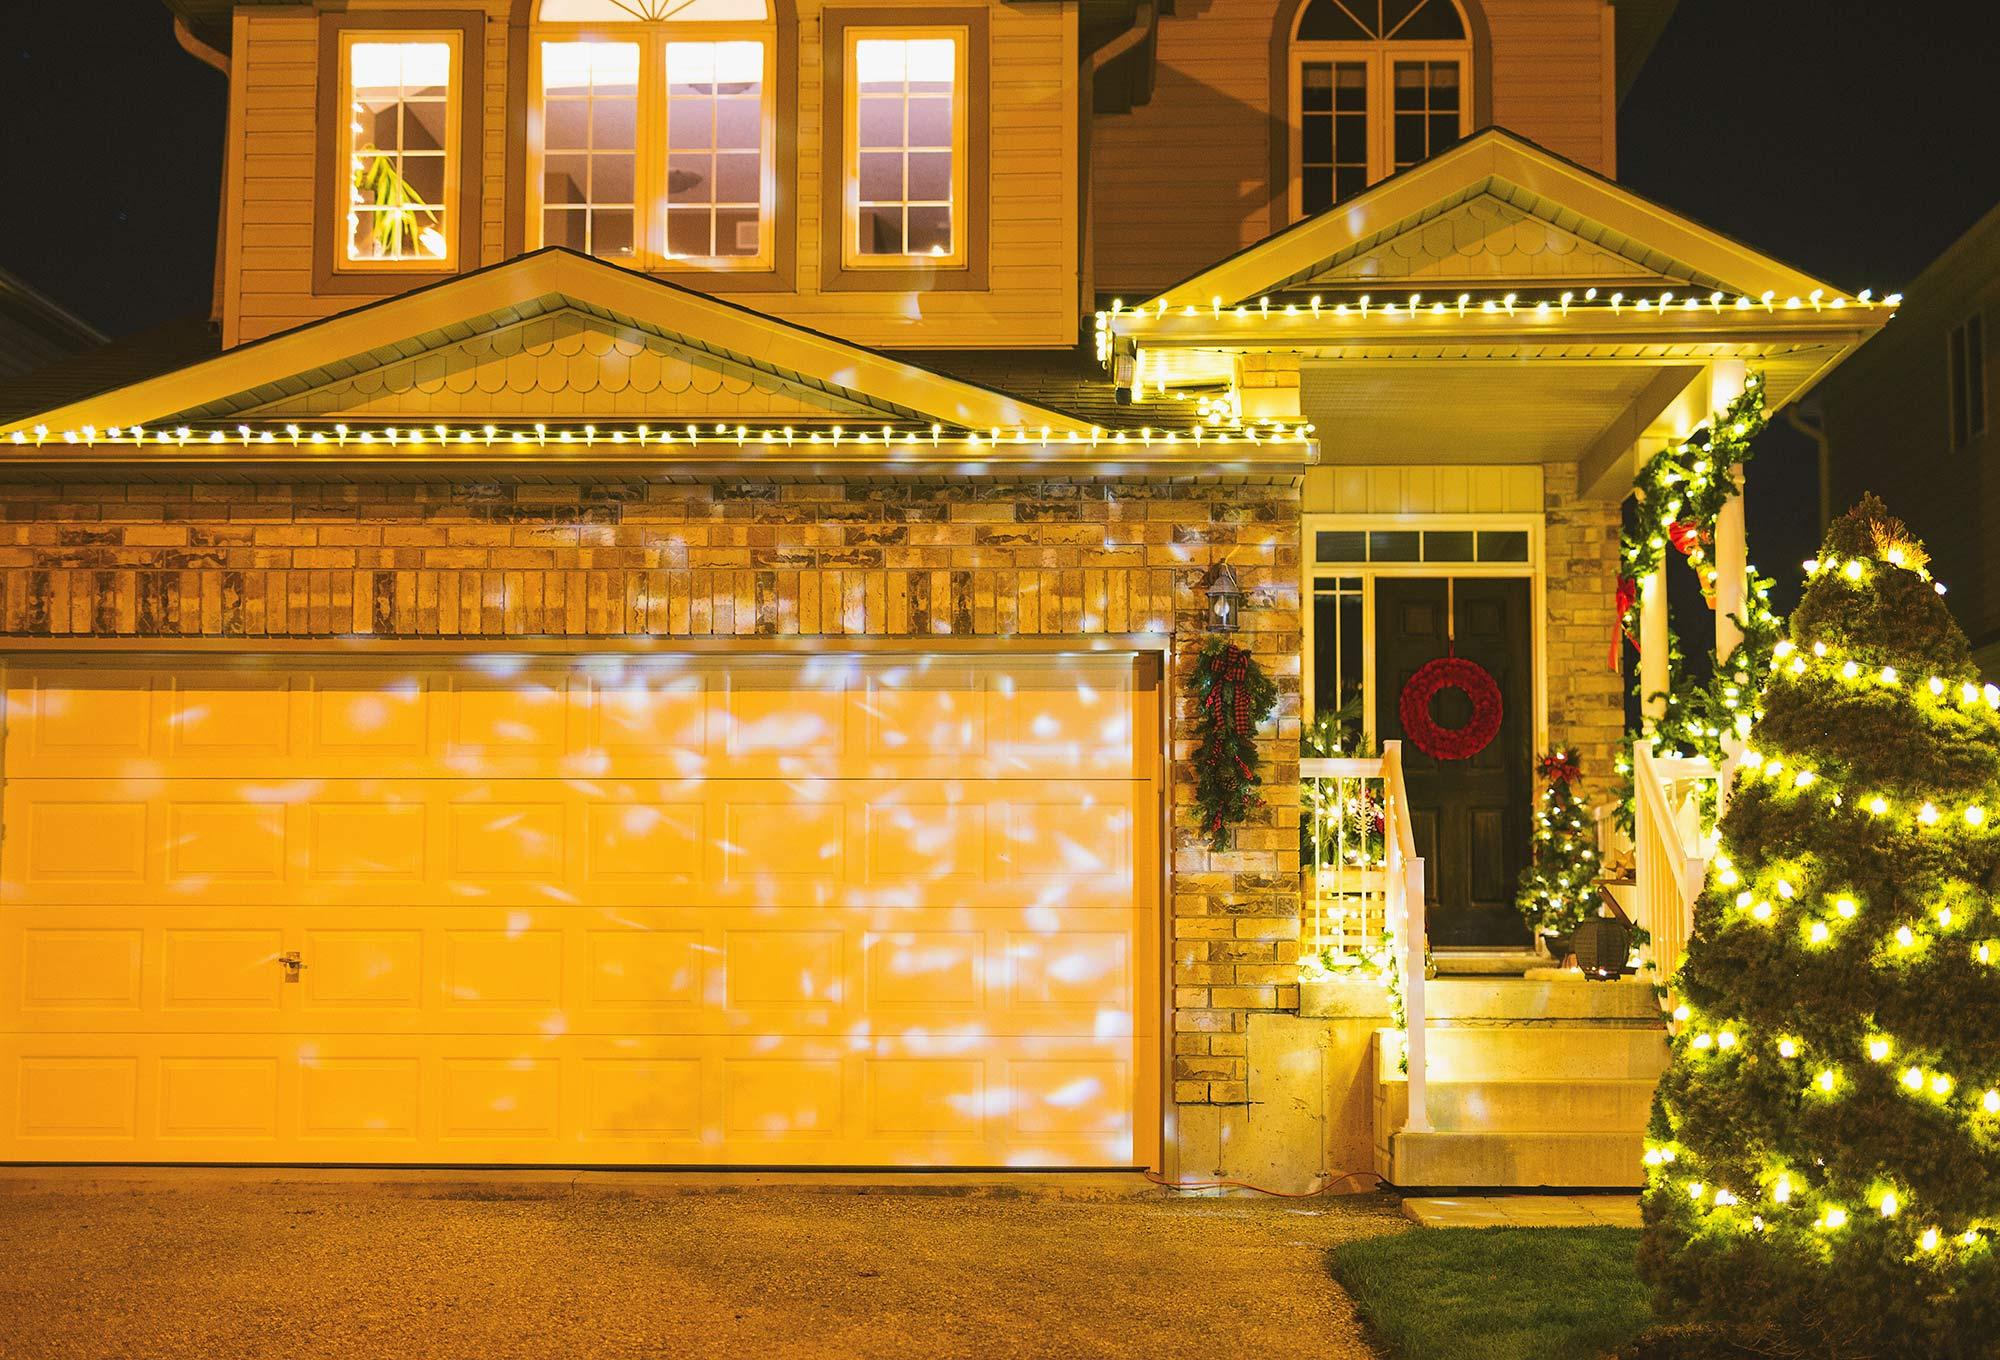 applight-kaleidoscope-spotlight-home-depot